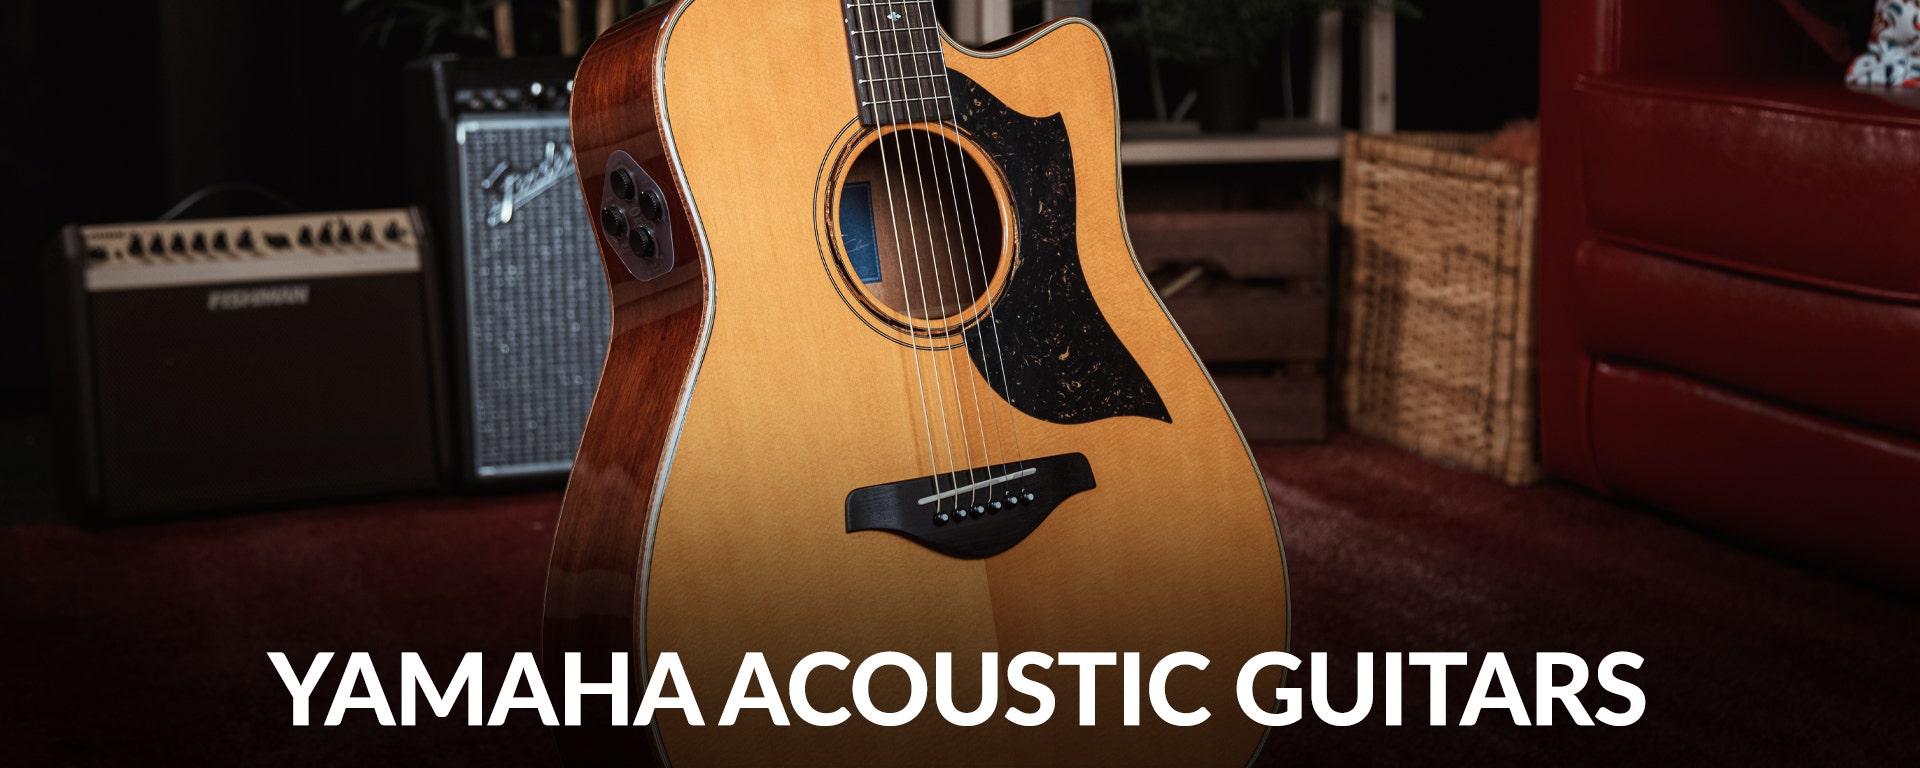 Shop Yamaha Acoustic Guitars at SamAsh.com